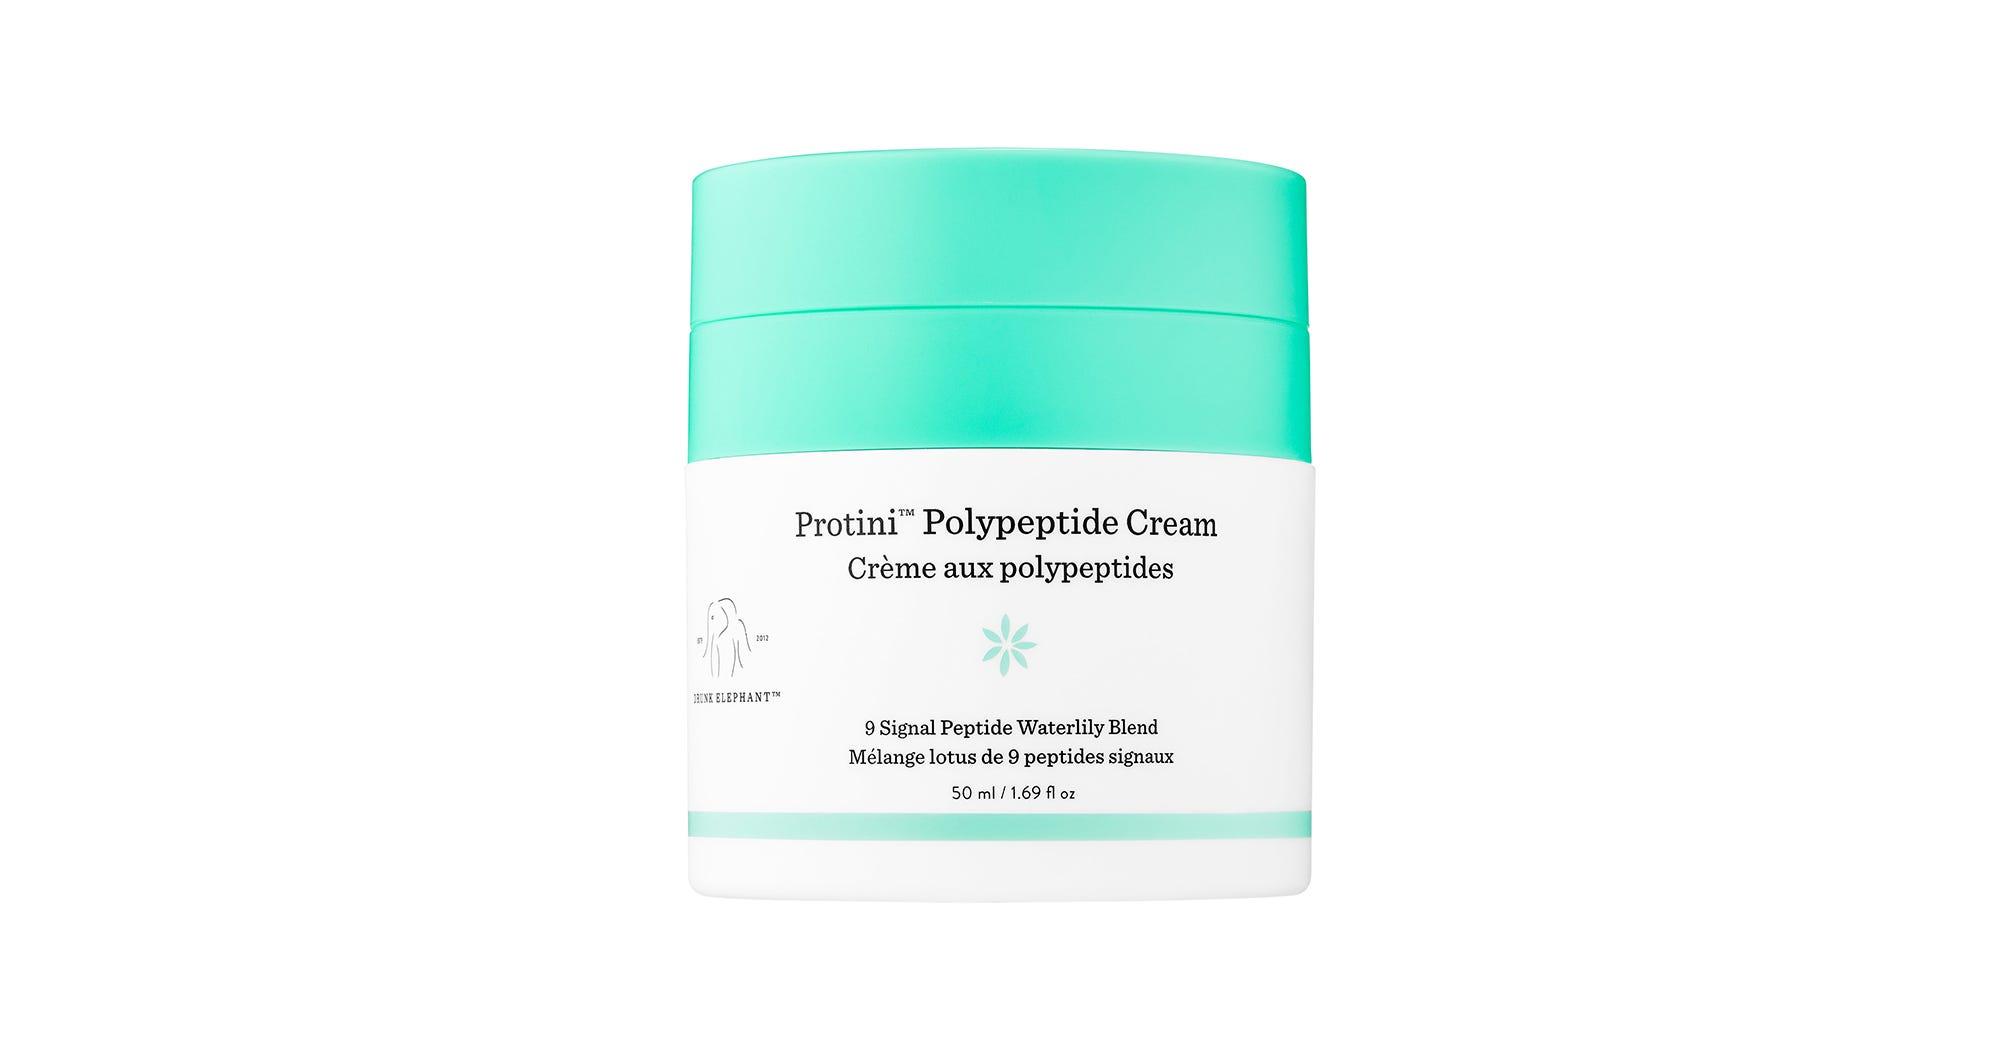 Drunk Elephant Protini Polypeptide Cream Review